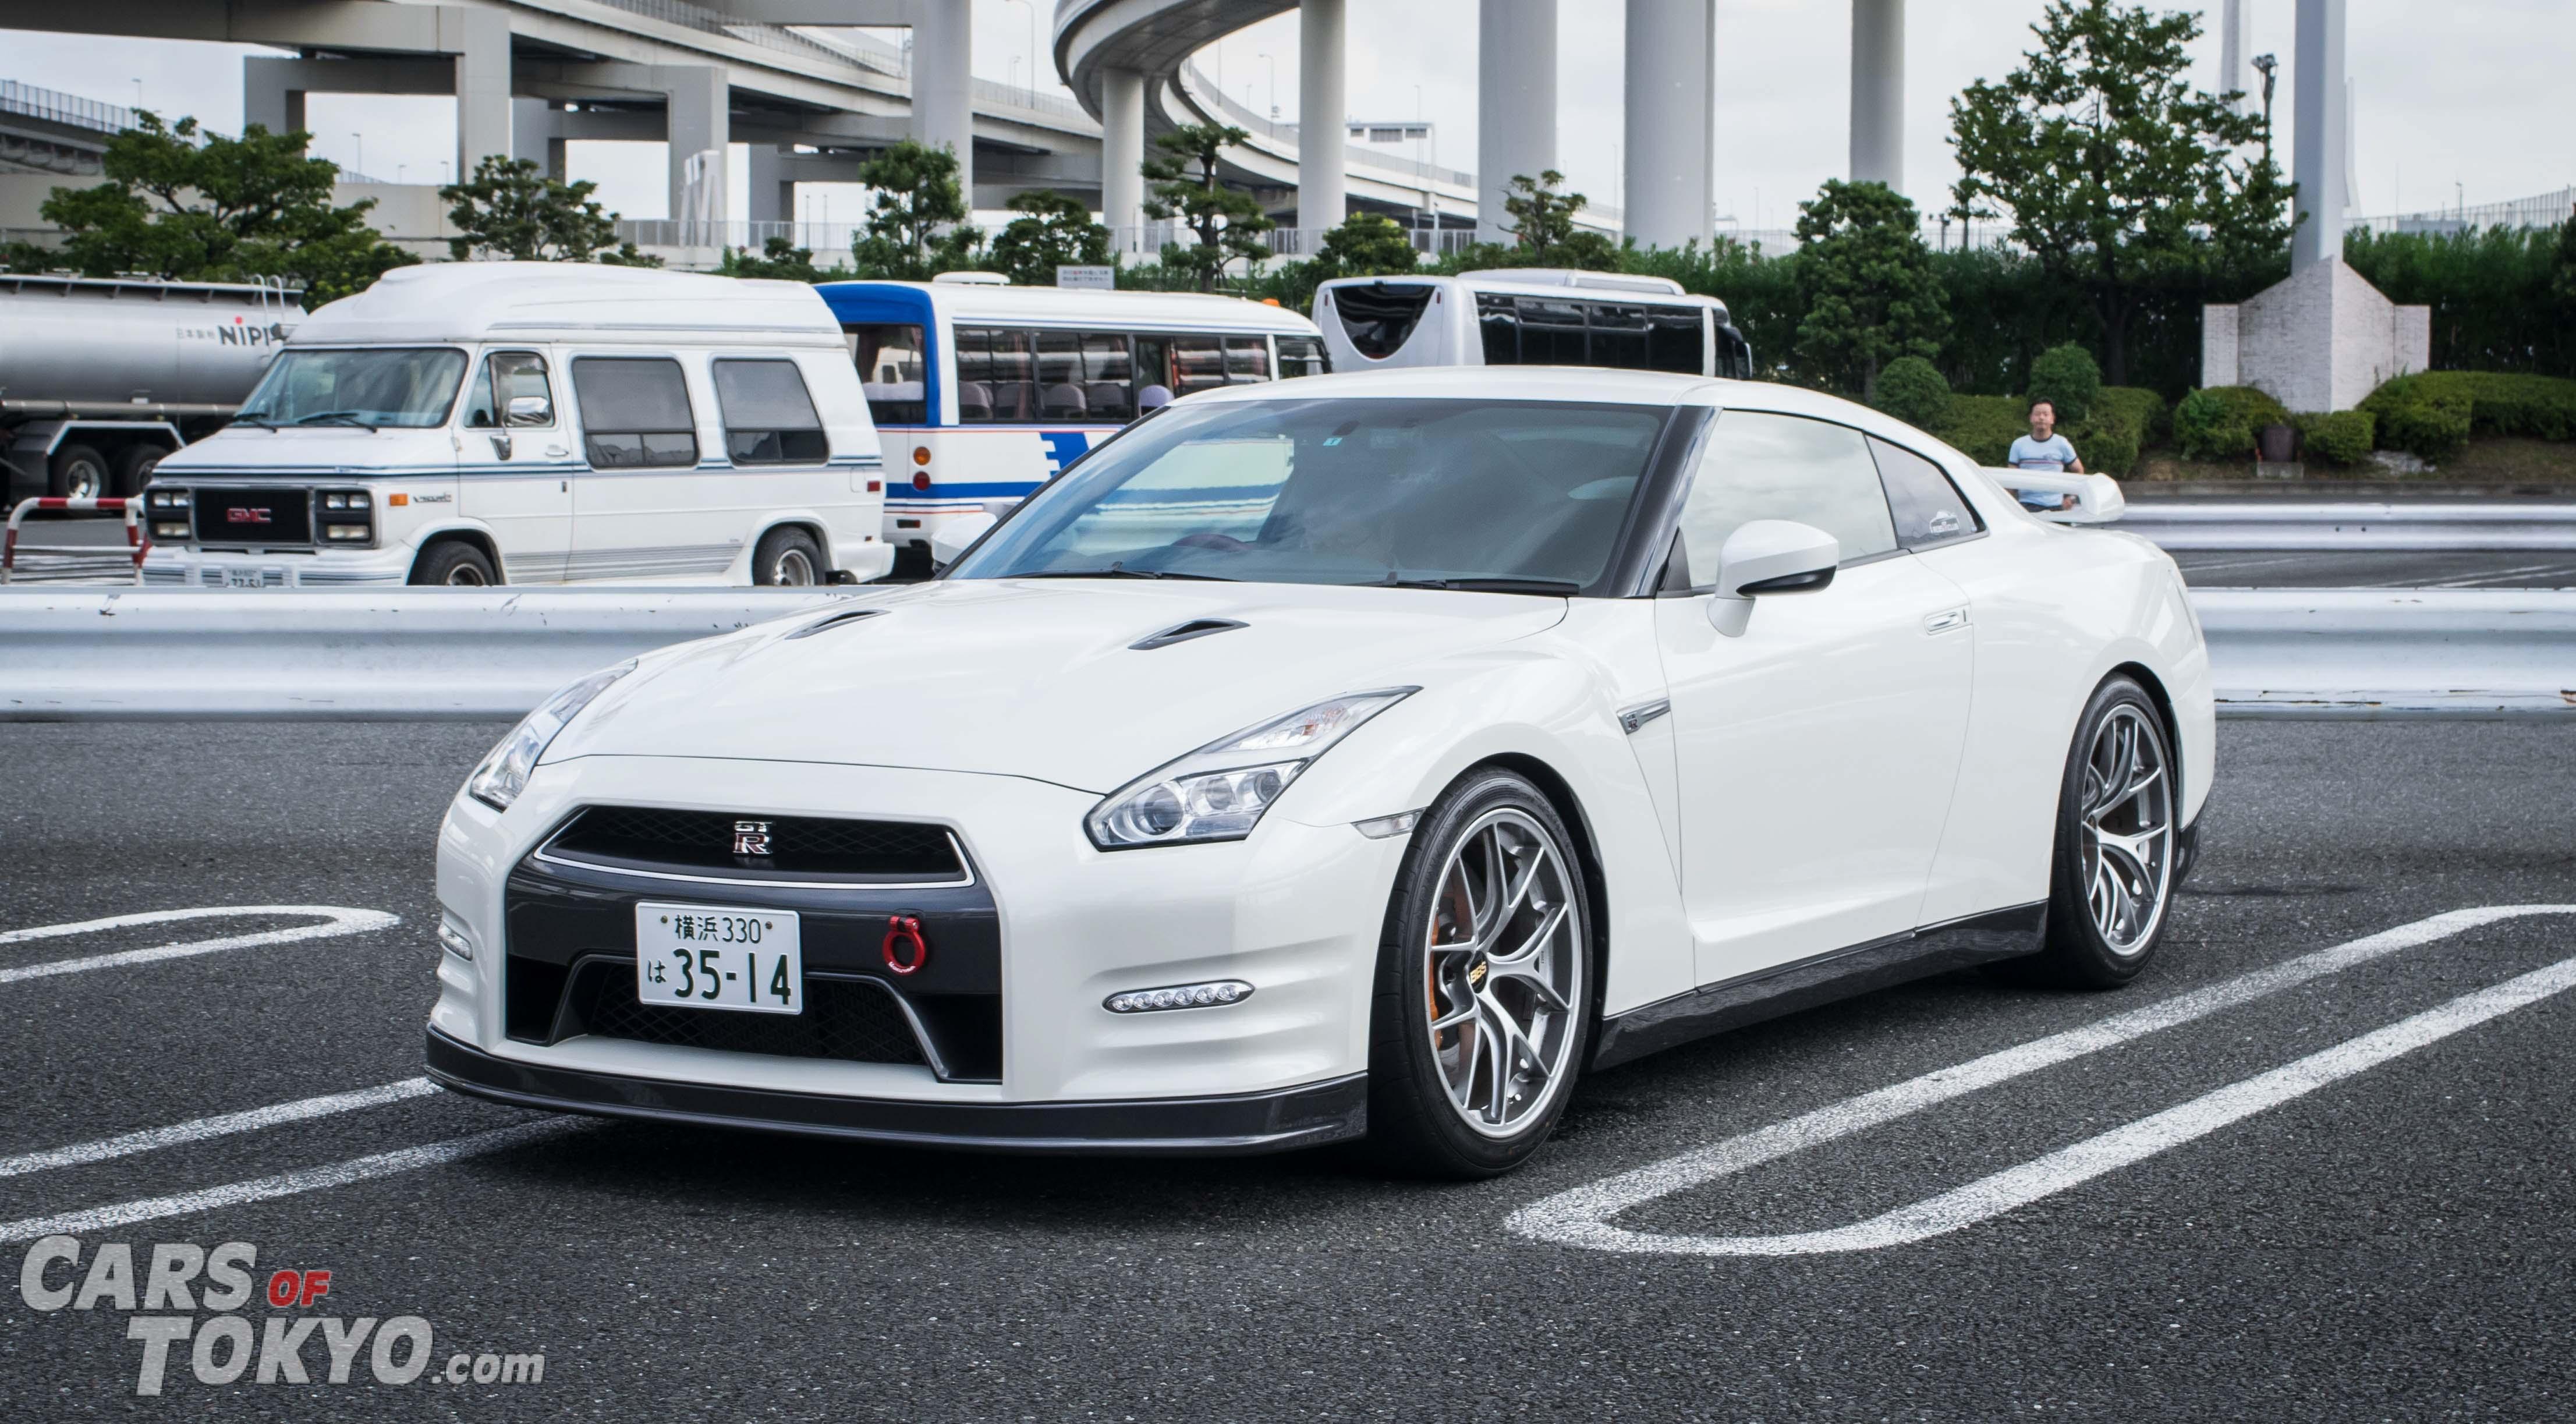 cars-of-tokyo-nissan-gtr-r35-bbs